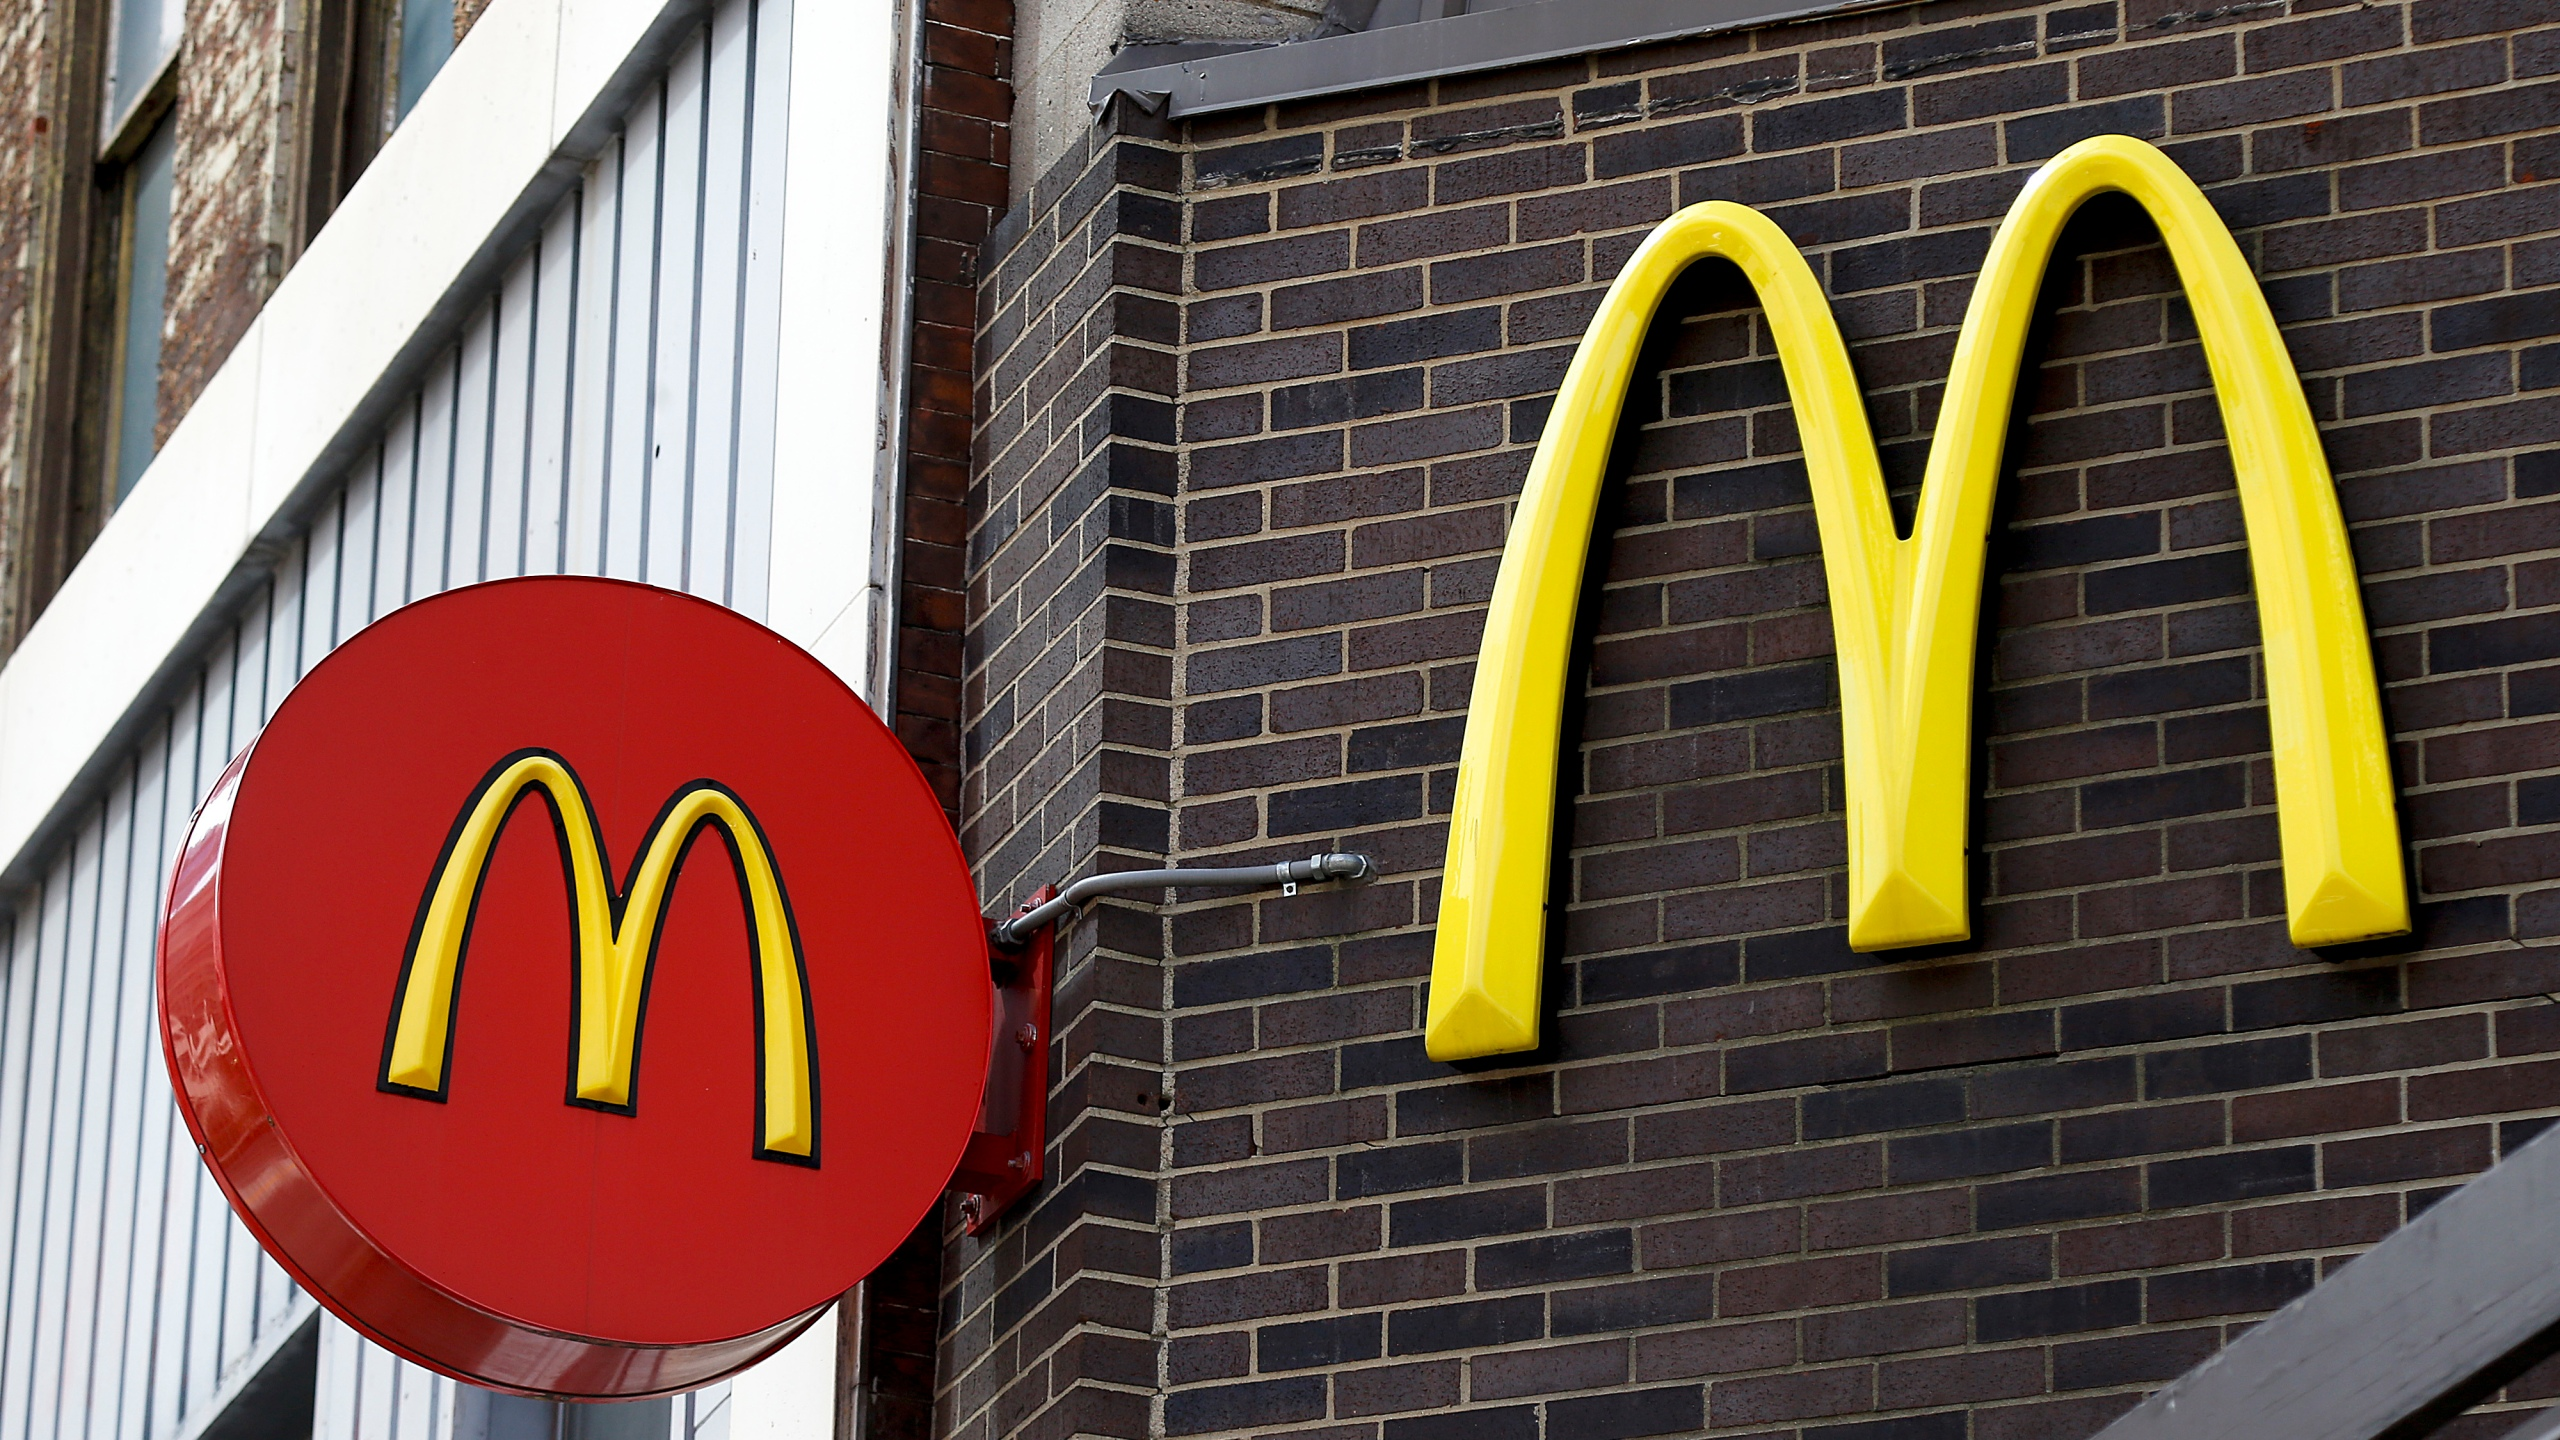 McDonalds_Fresh_Beef_76459-159532.jpg30219613